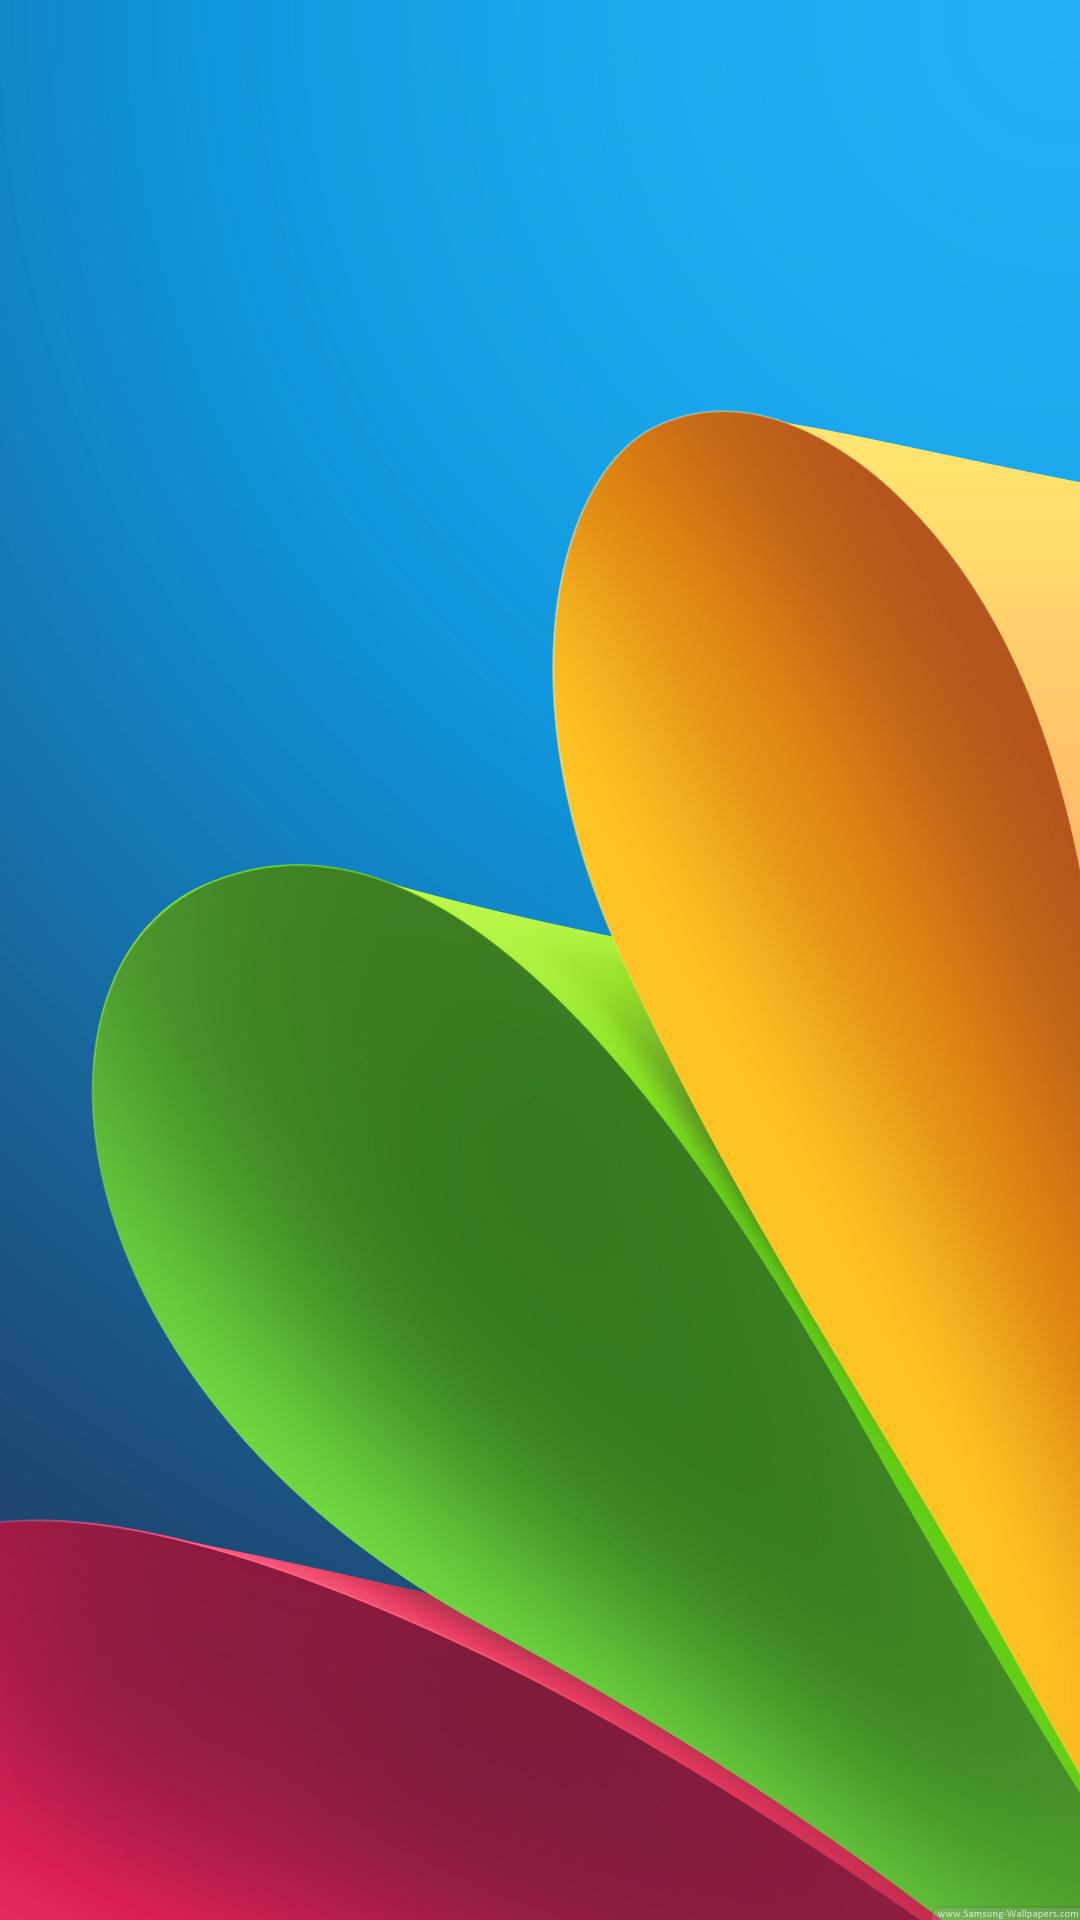 Full Hd Wallpaper 1080p Fullhd Wallpaper Download 1080x1920 Download Hd Wallpaper Wallpapertip